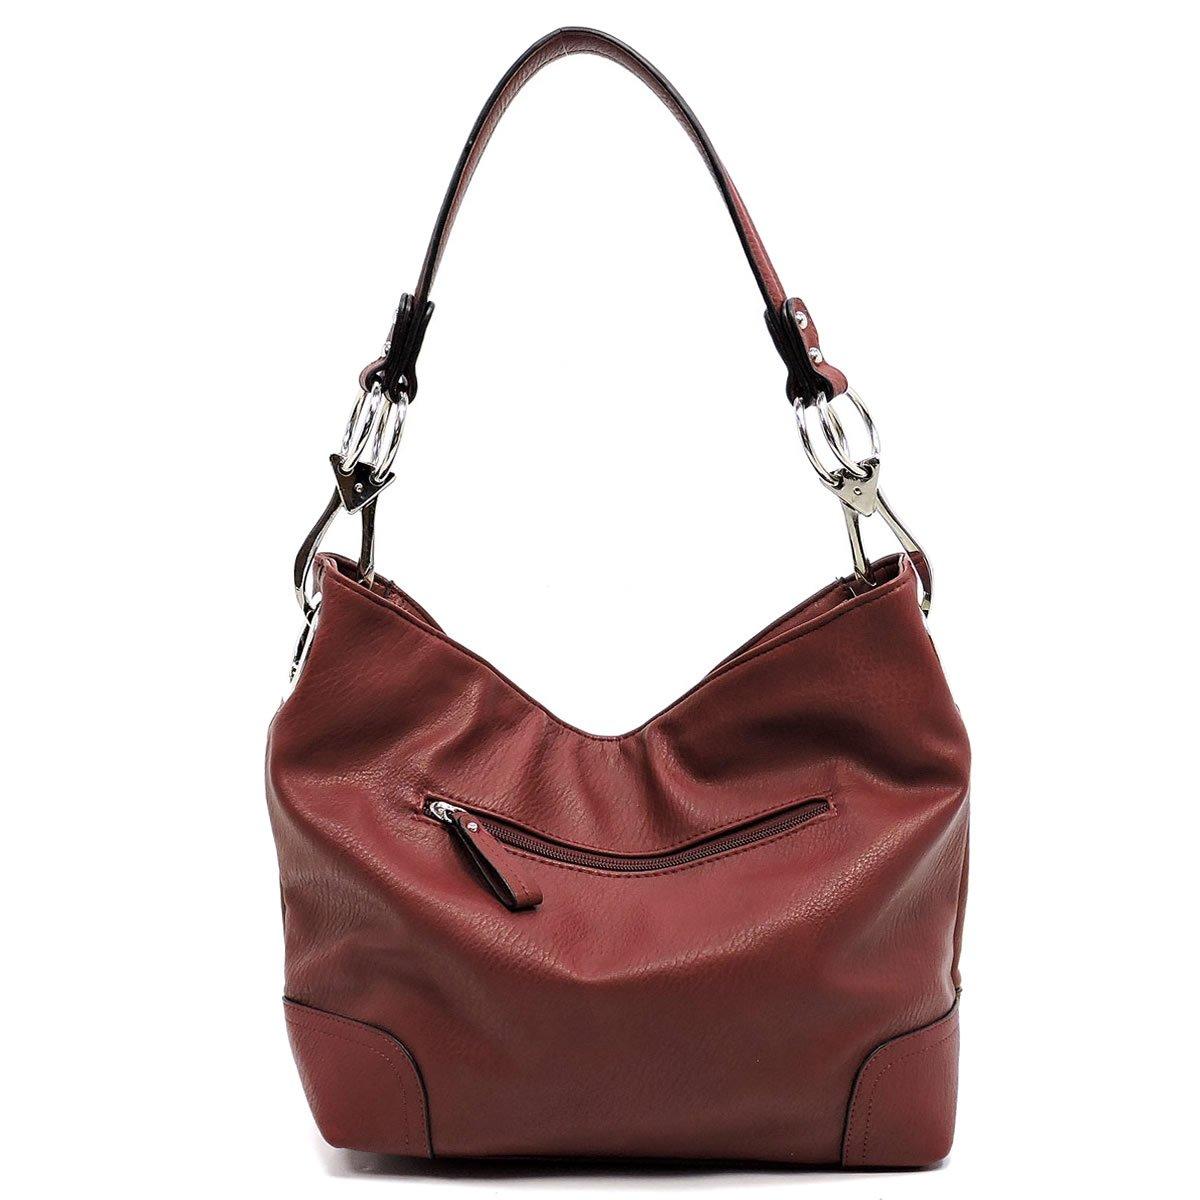 3fa4d3600e Elphis Fashion Classic Shoulder Bag Hobo Bucket Handbag Purse  (79-Burgundy)  Amazon.ca  Shoes   Handbags